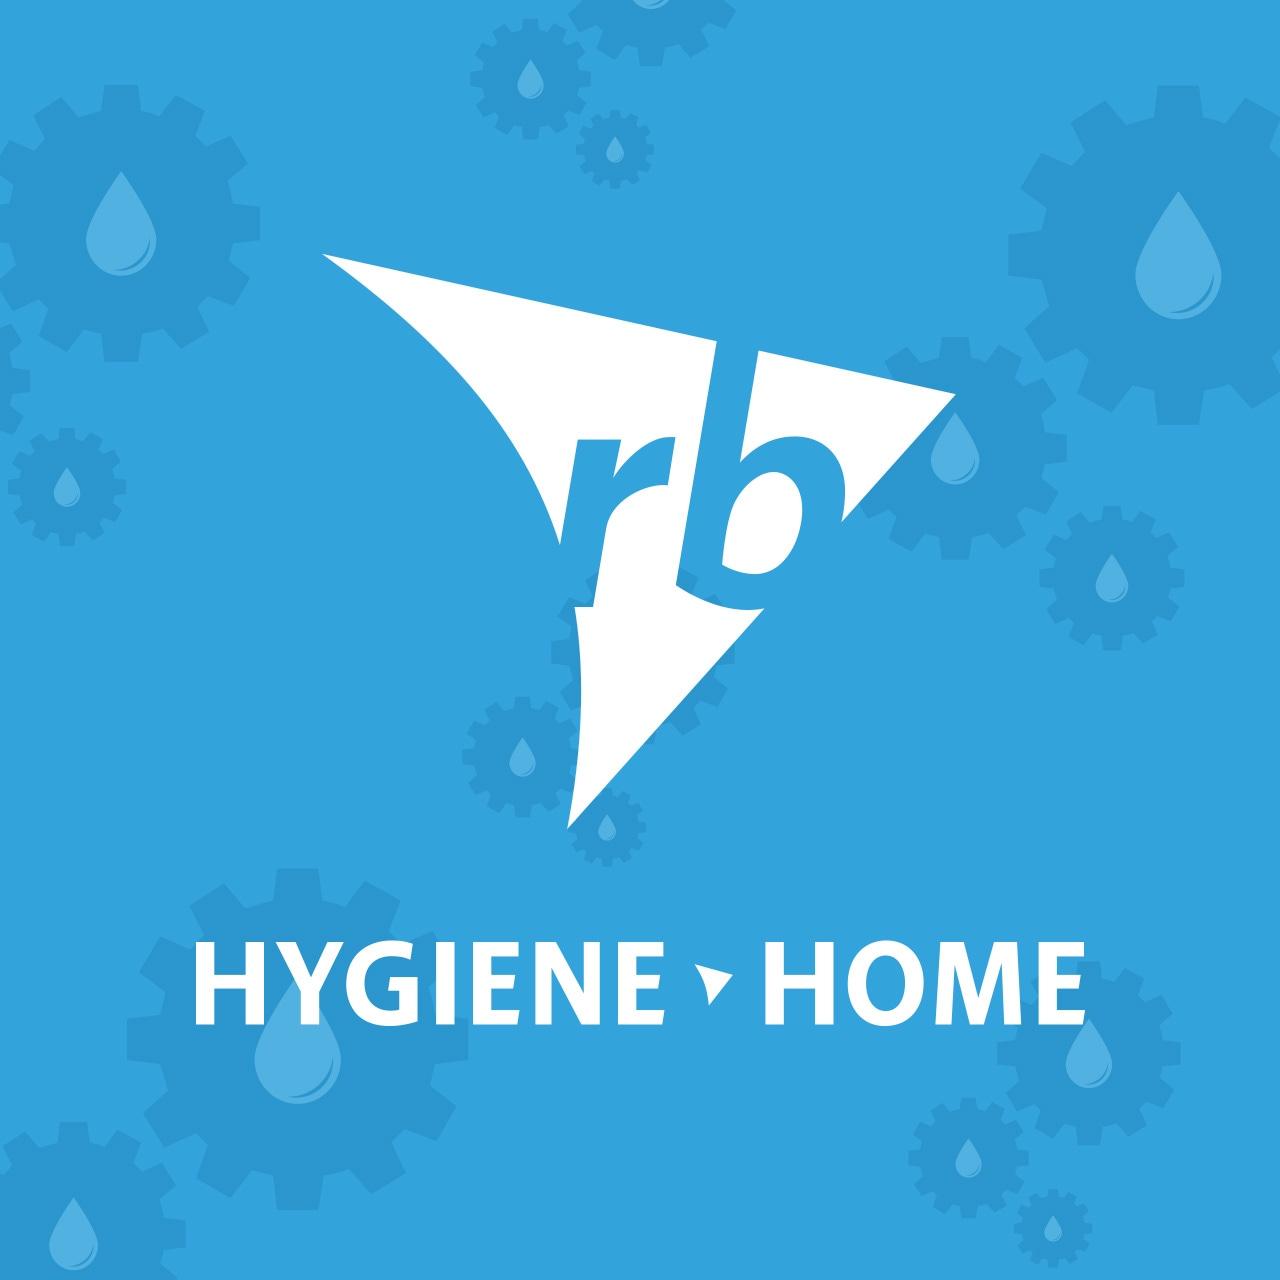 Hygiene home logo